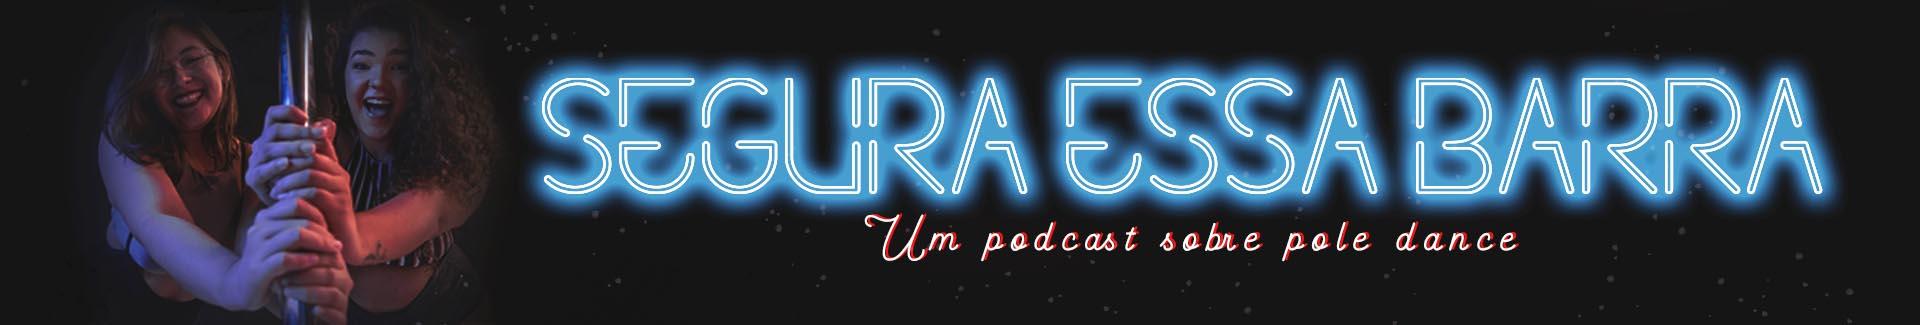 Banner Segura Essa Barra